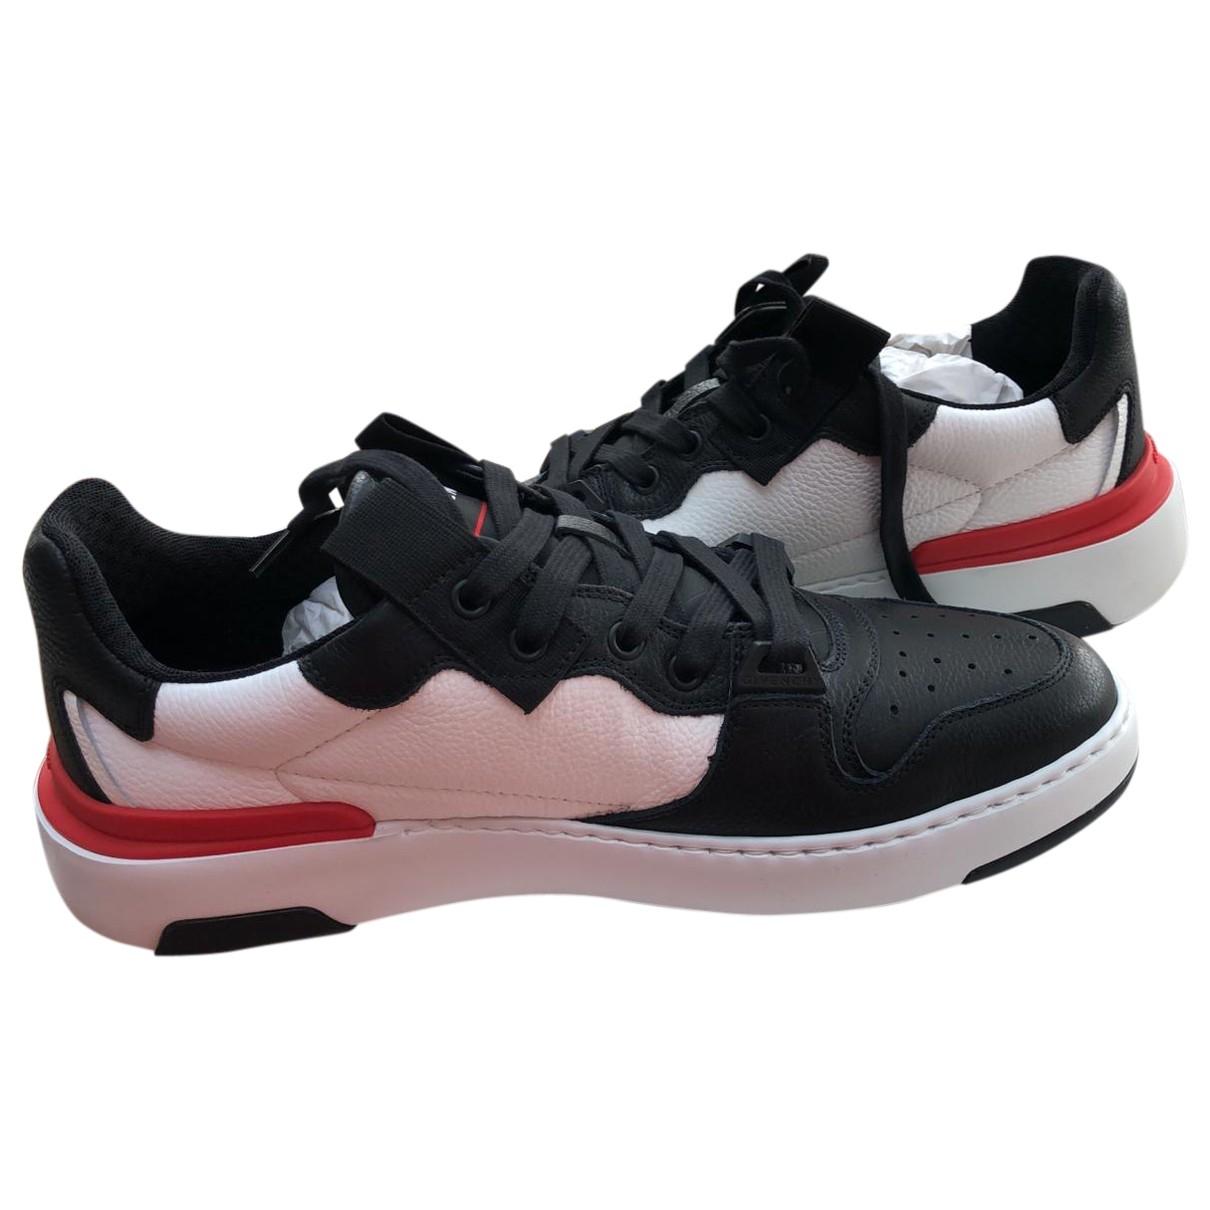 Givenchy \N Sneakers in  Bunt Leder